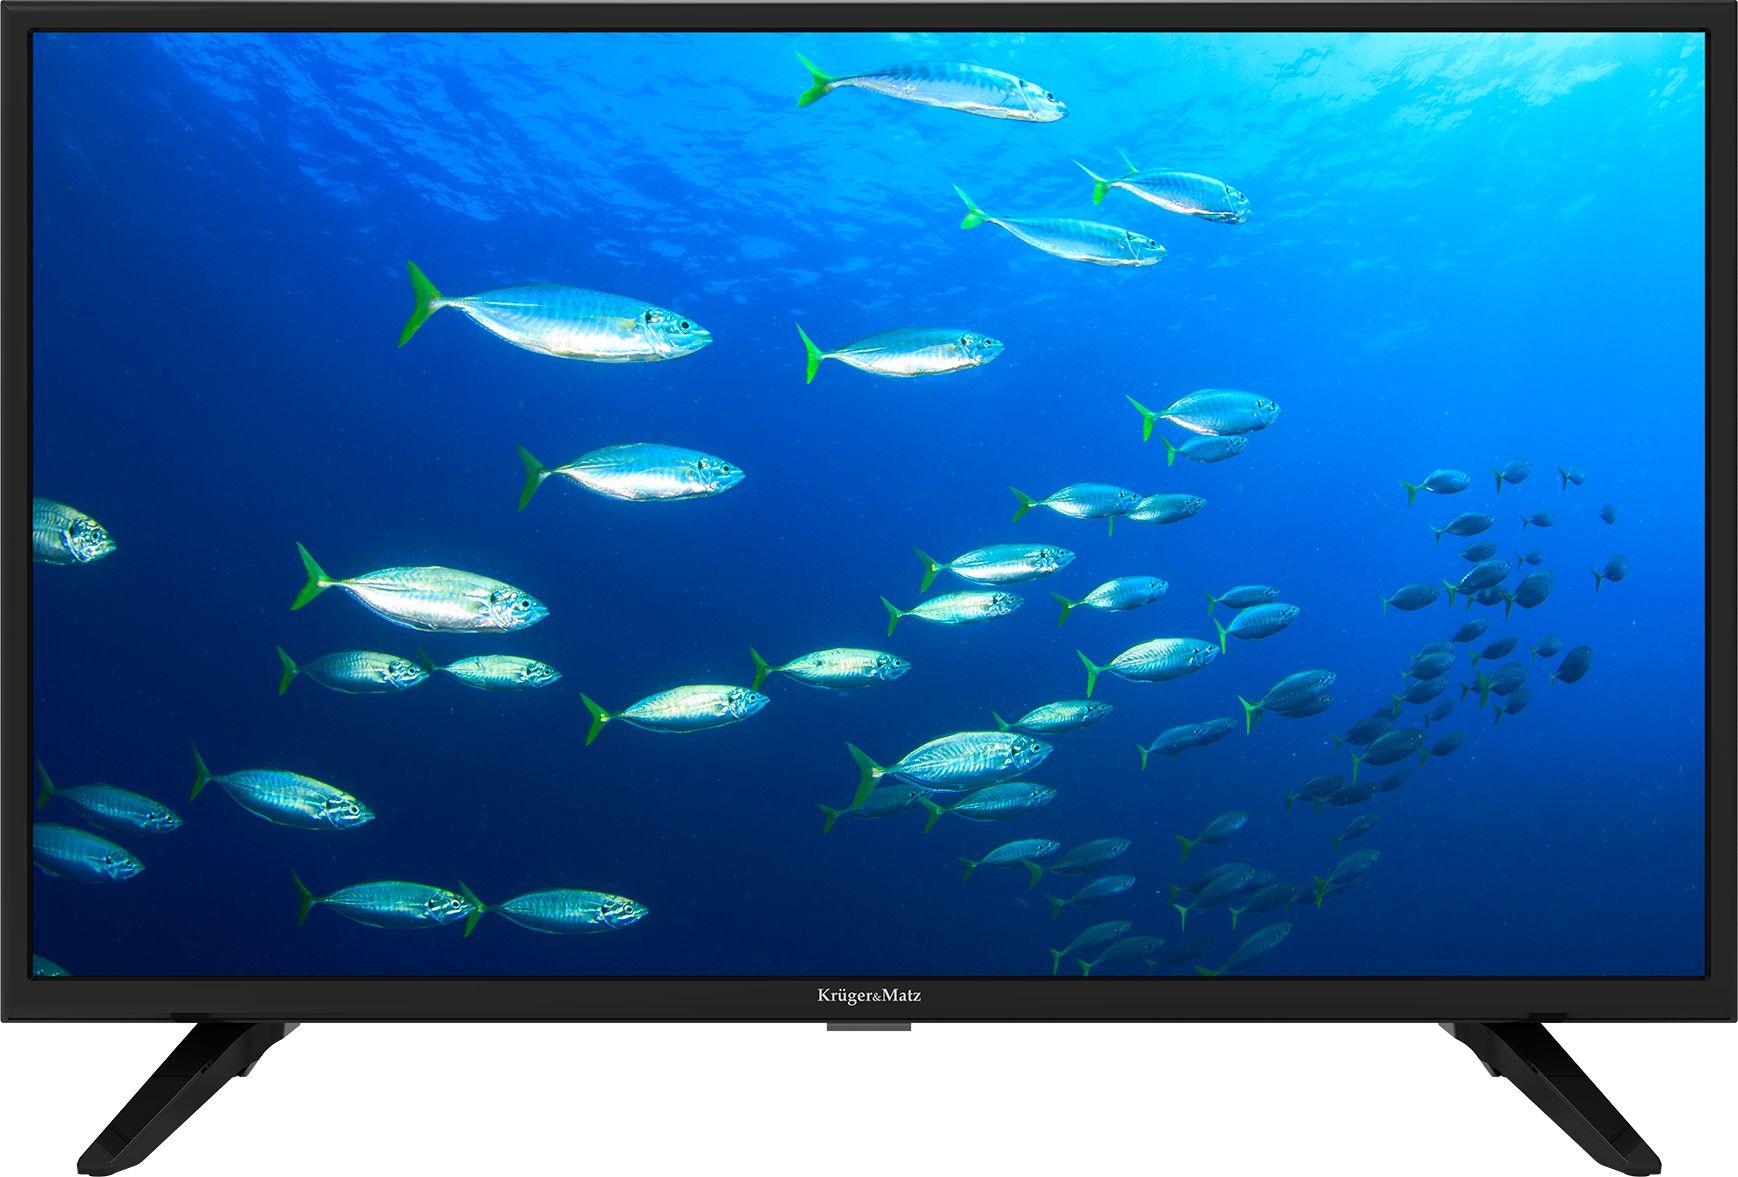 HD TV 32 INCH DVB-T2 H 265 LED Televizors